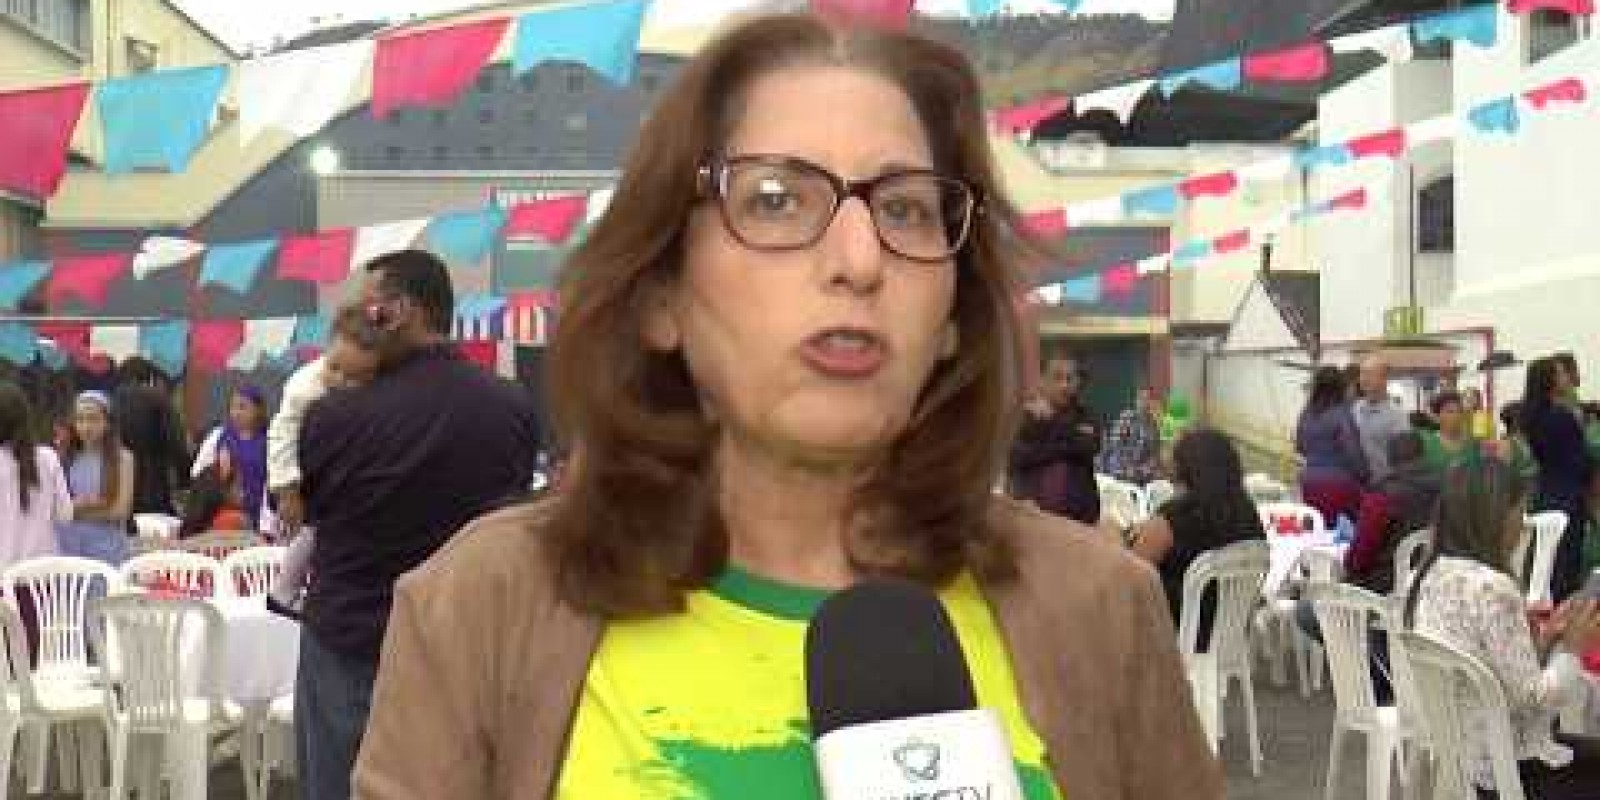 ESCOLA JAIRO GROSSI PROMOVE FESTA CULTURAL QUE TRAZ COMO TEMA A COPA DO MUNDOnovo-video-2018-06-12-16-42-04